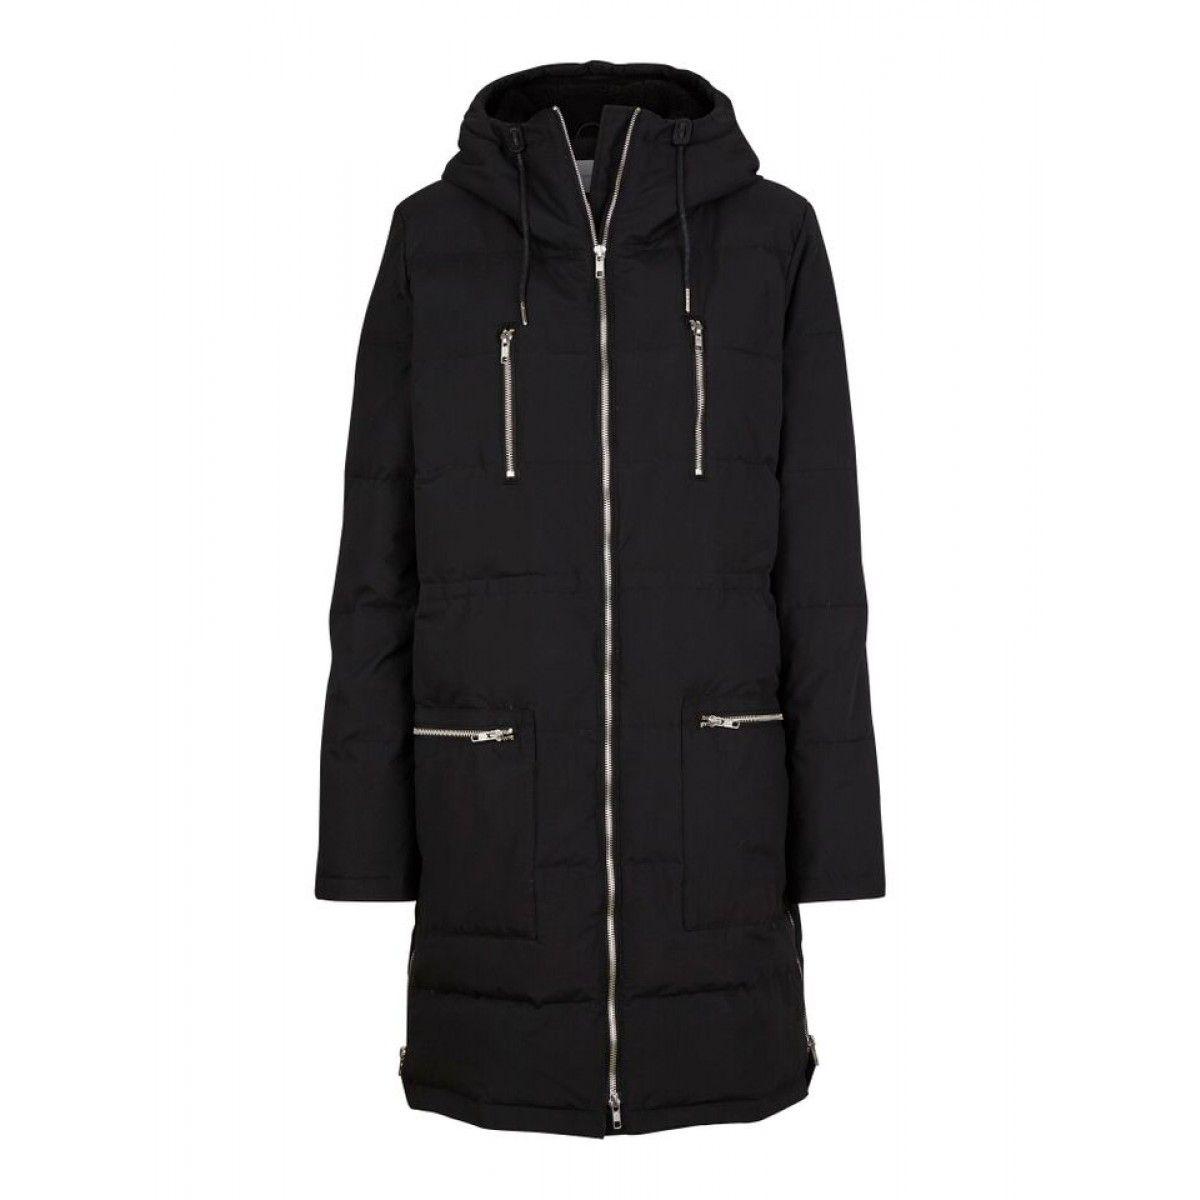 5fa5a5f9 Saturn coat | Frakker/jakker | Frakker, Jakker og Kvinder